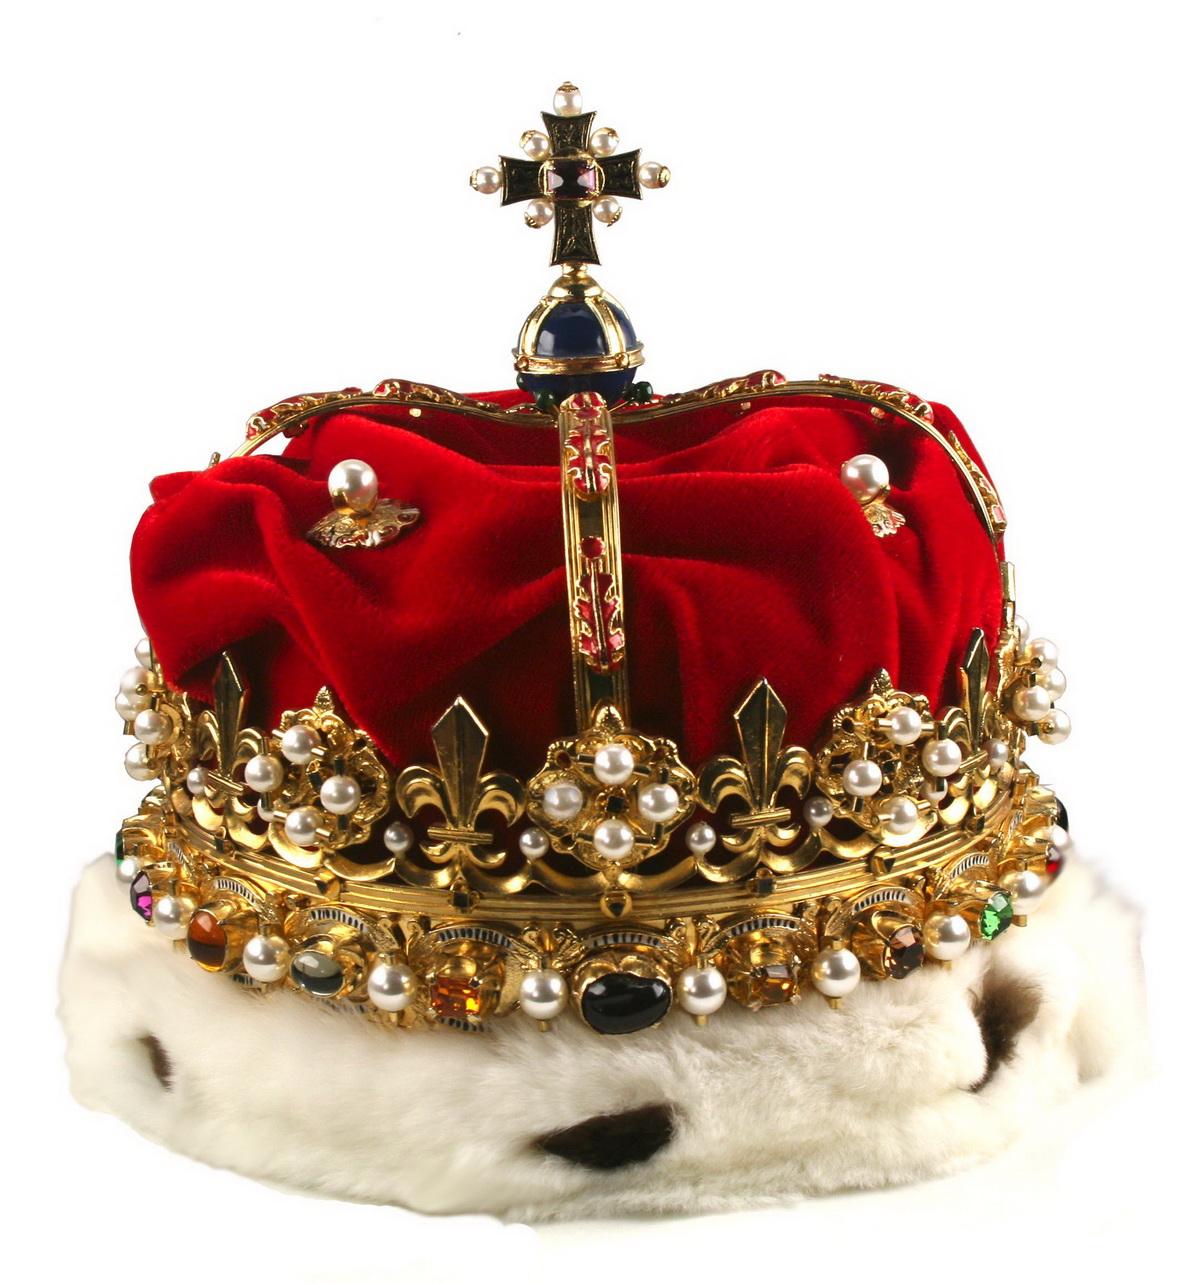 Crown of Scotland